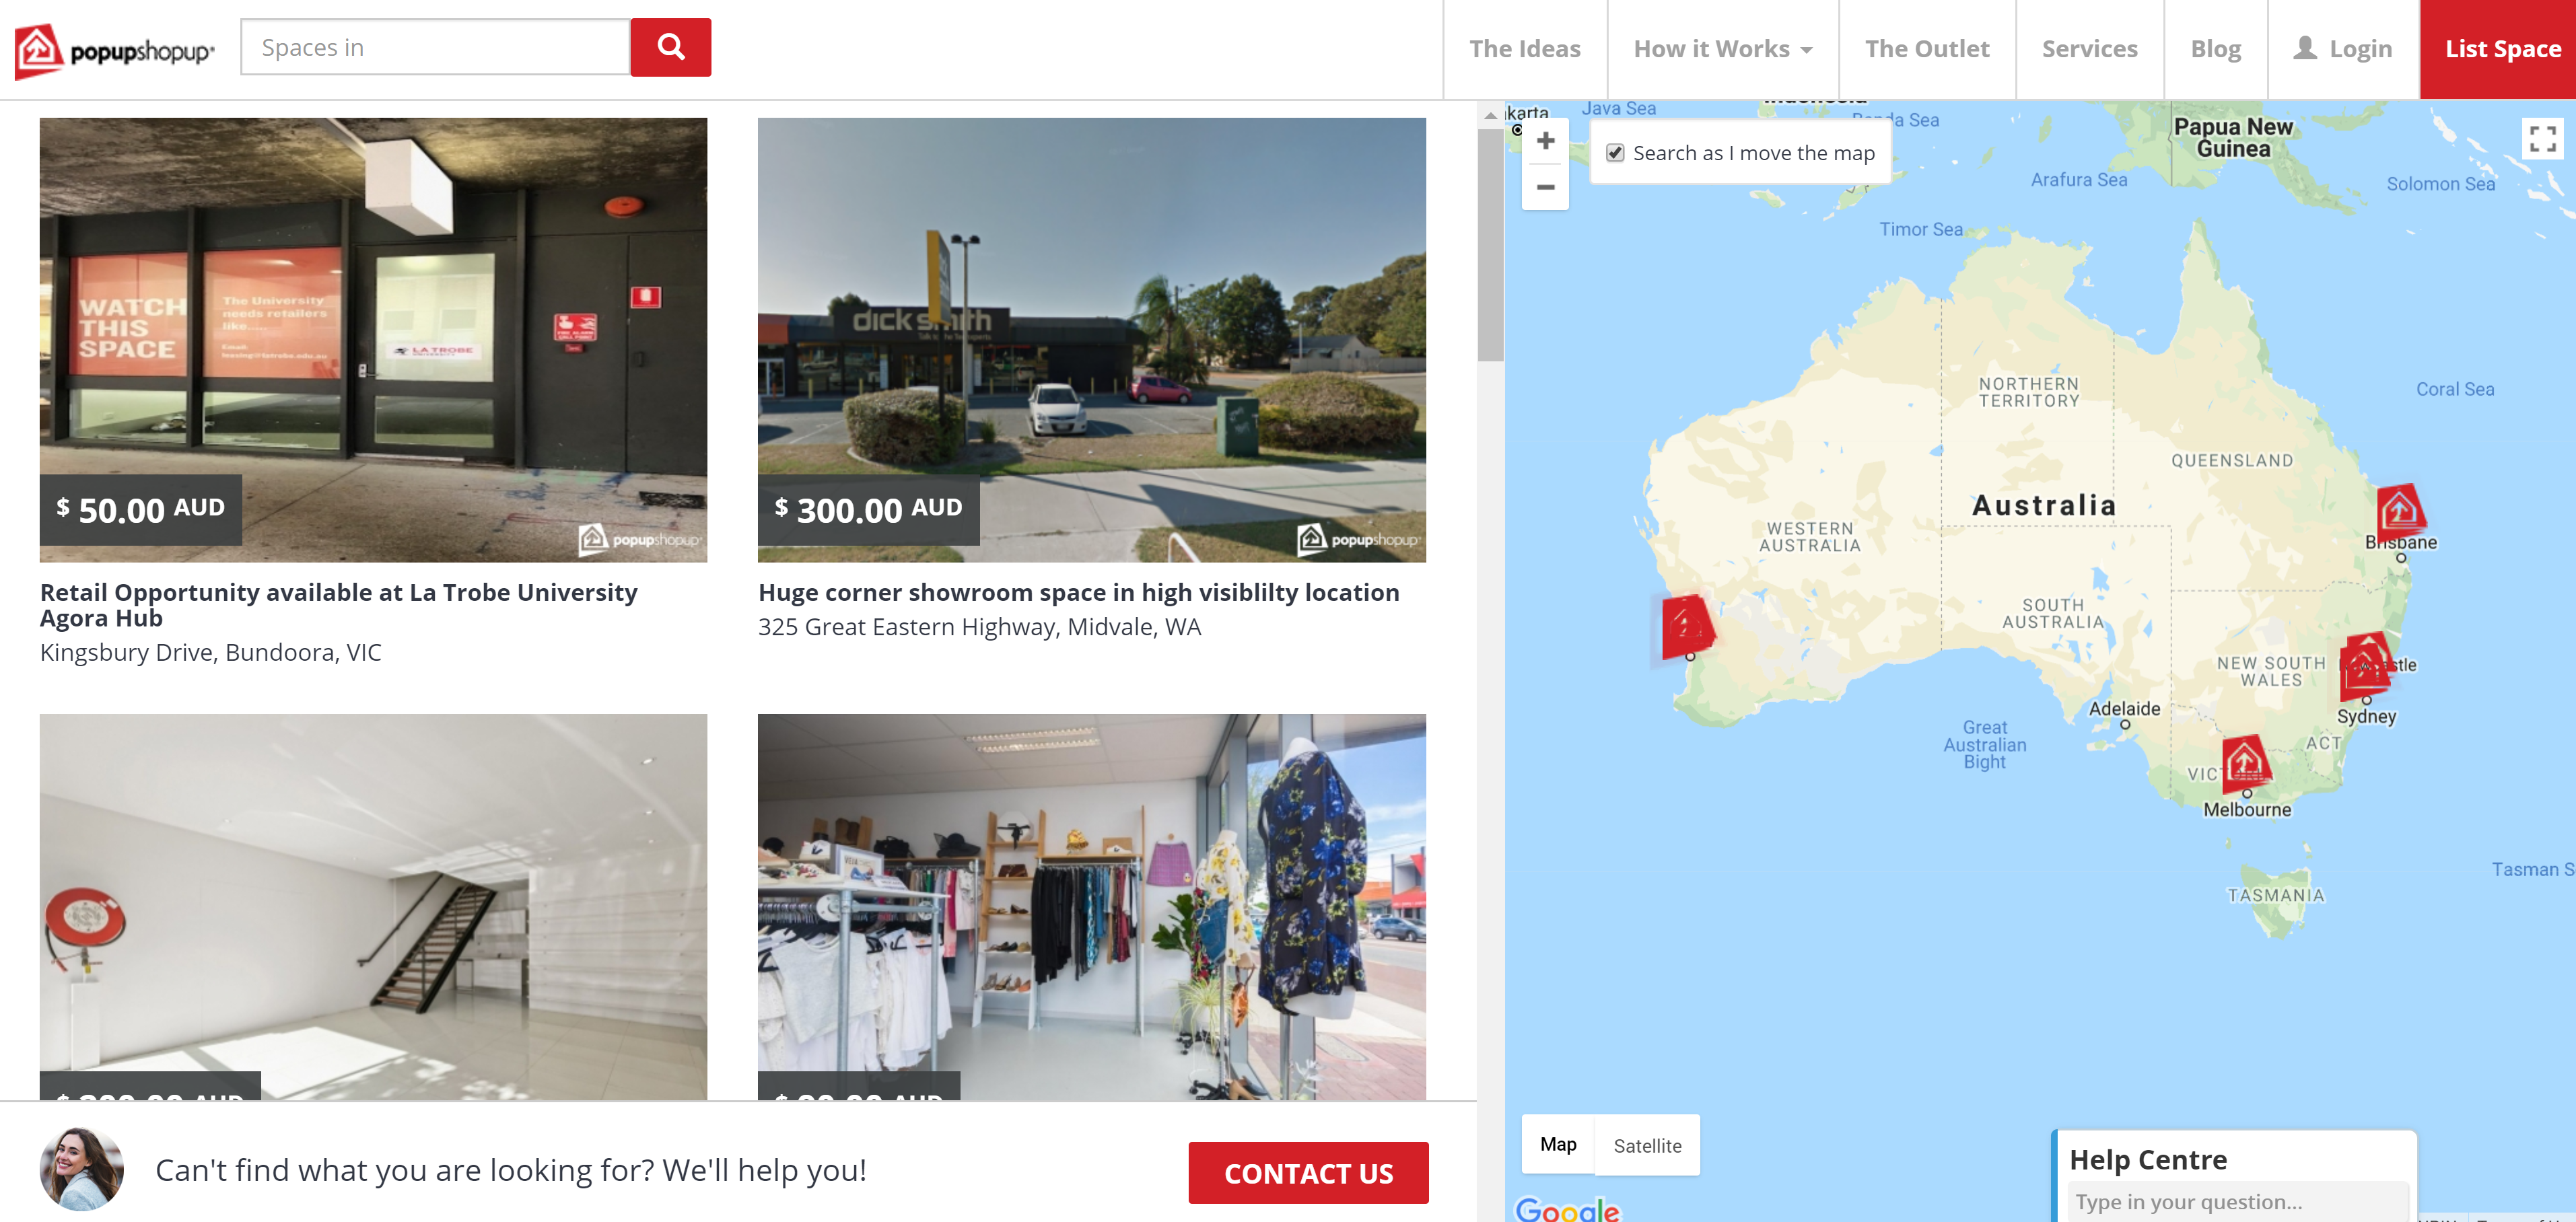 Popupshopup - Bray Marketing - Web Design Perth